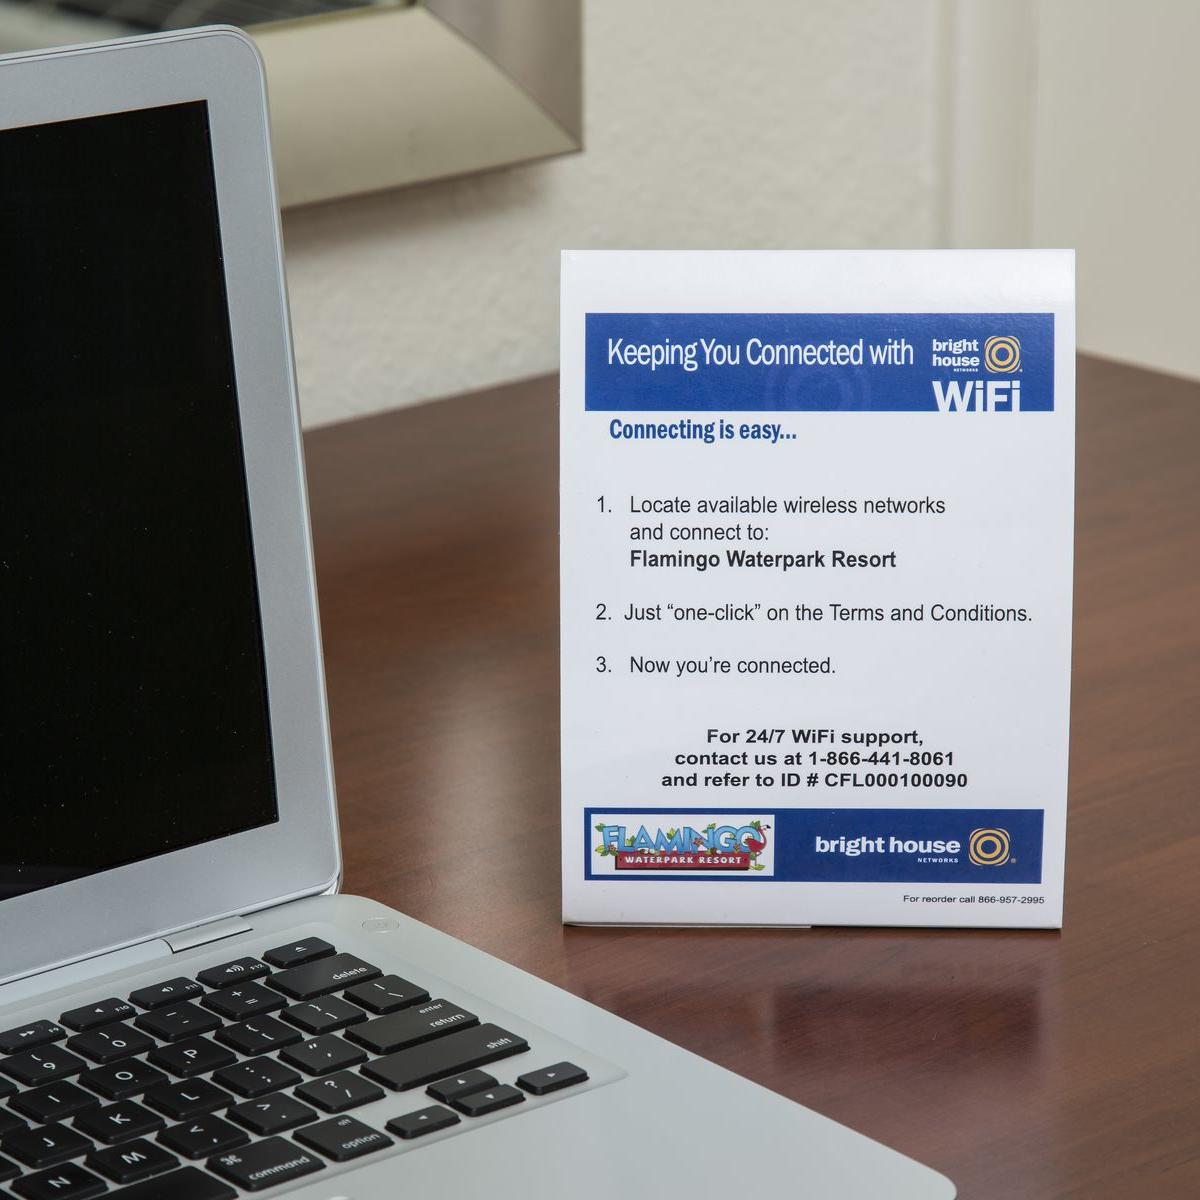 WiFi Information Card